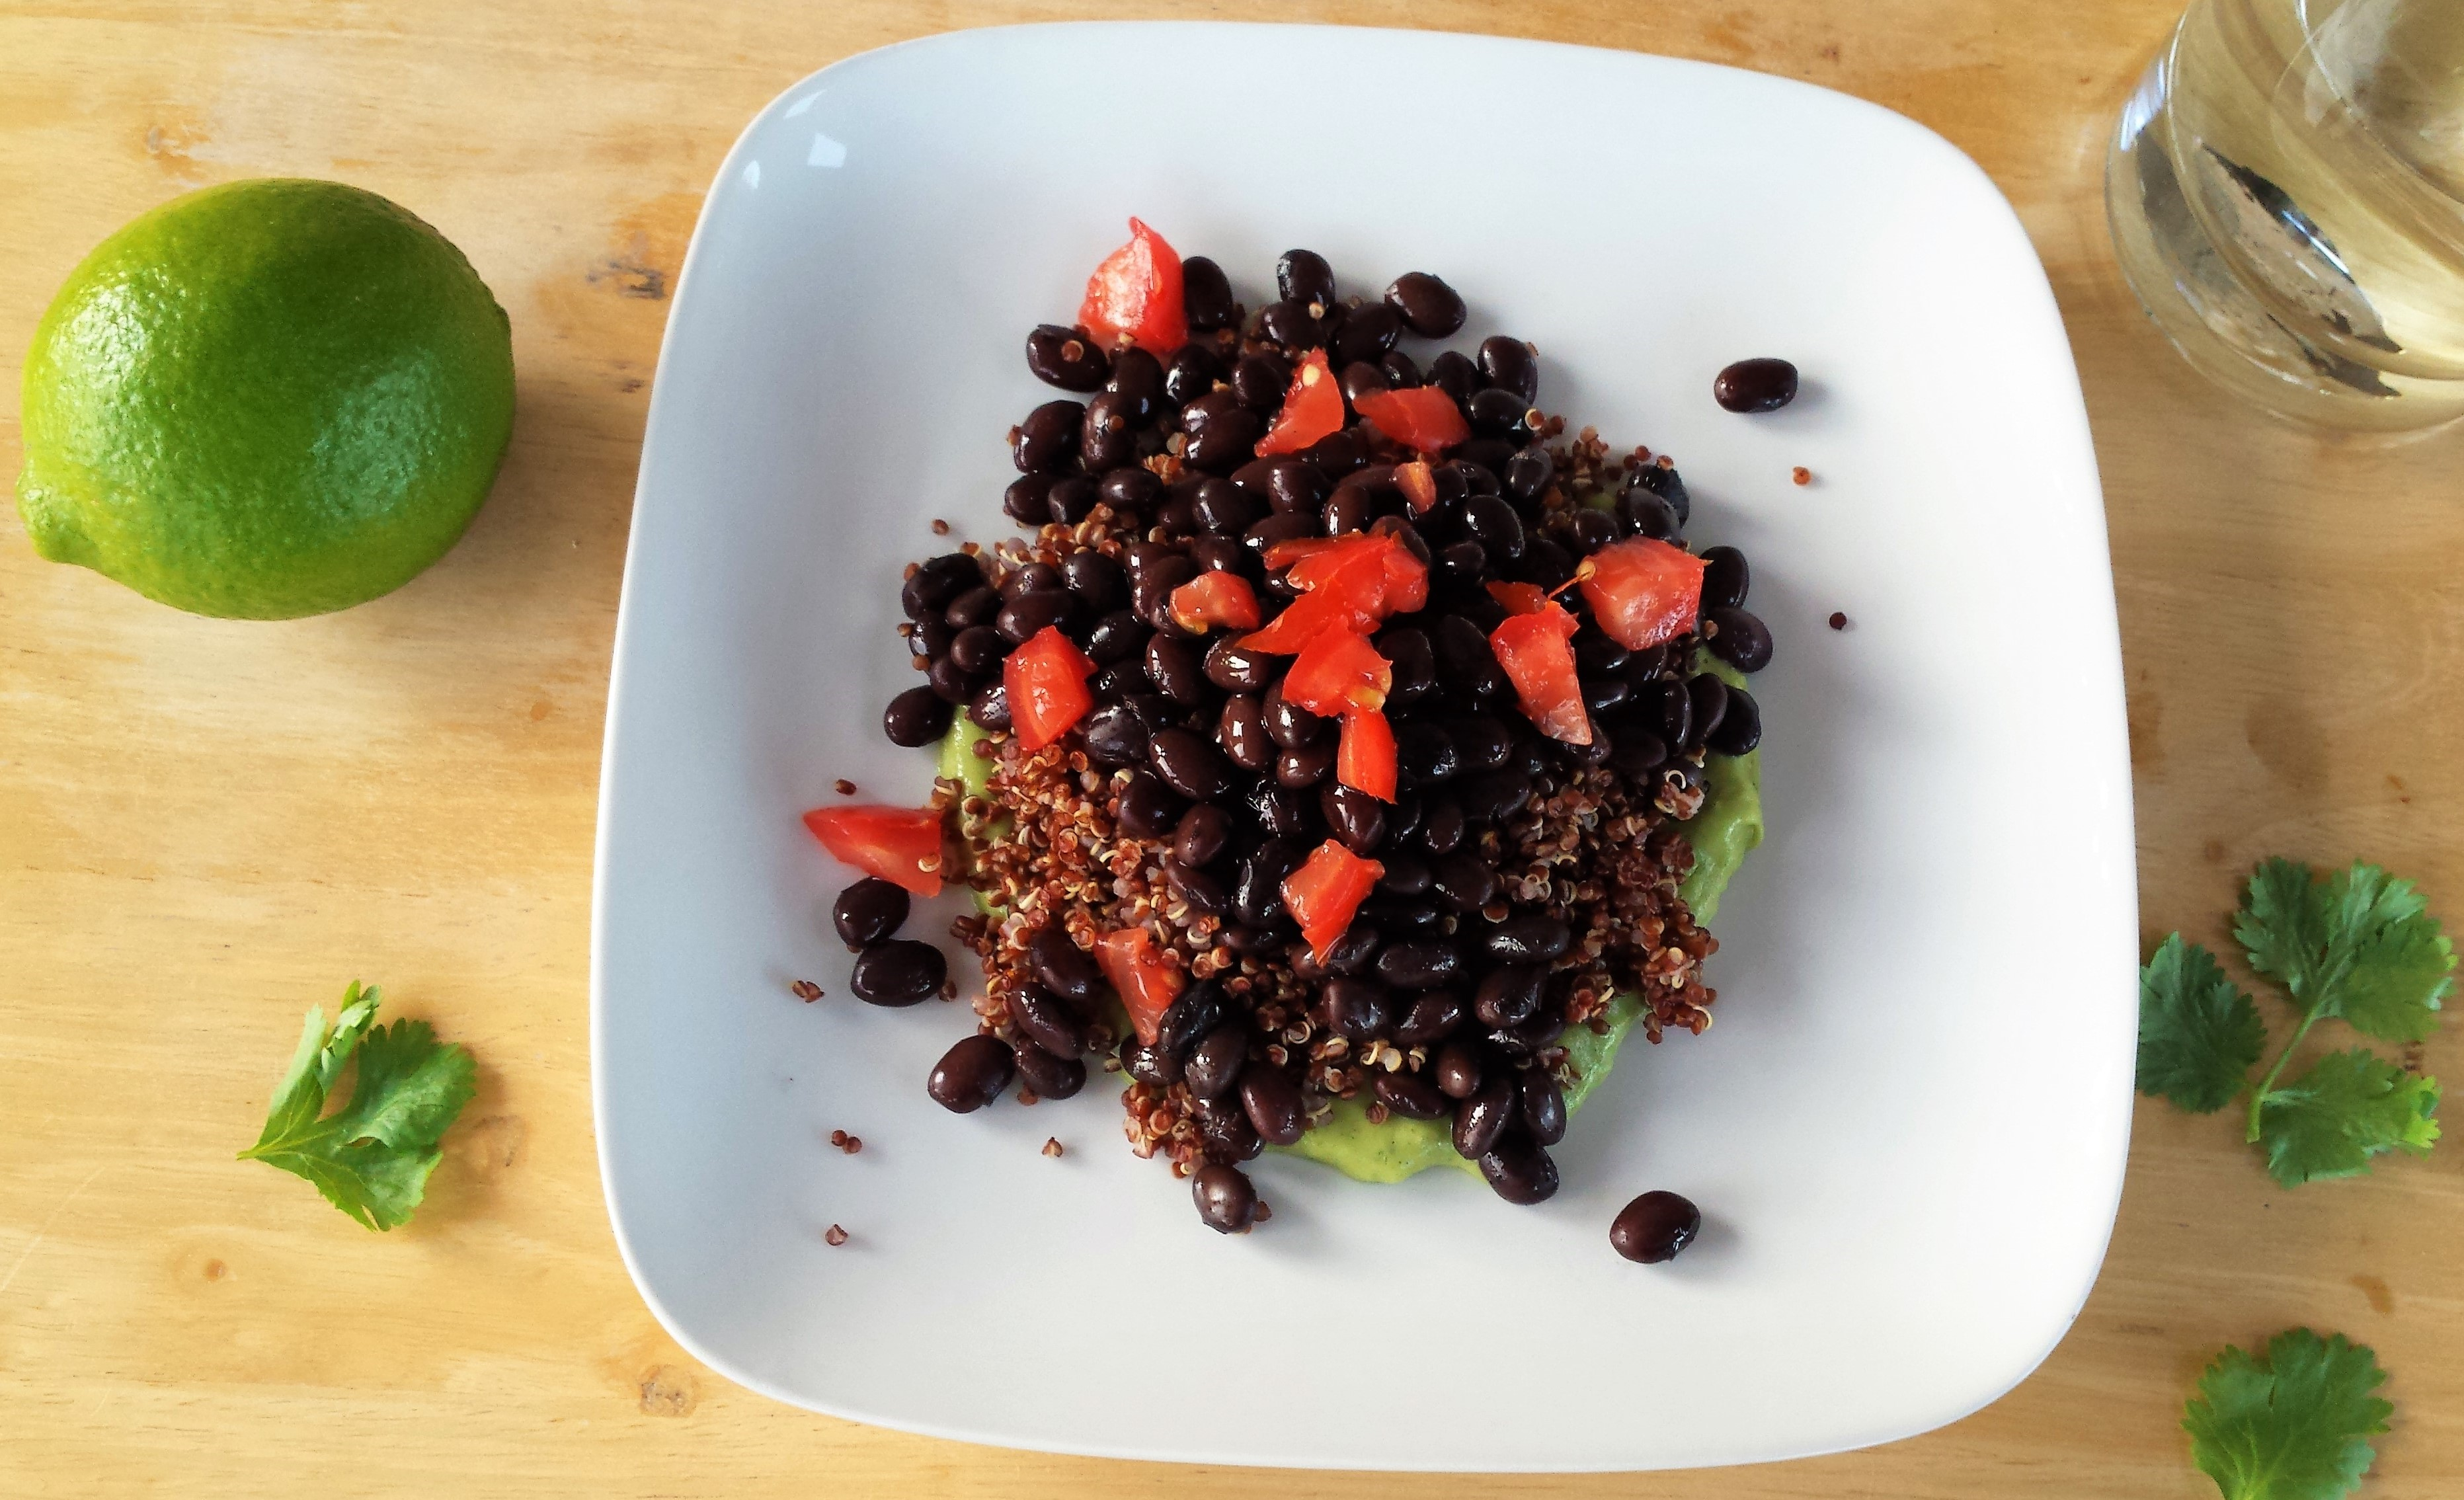 Quinoa and Black Beans with Avocado Cream Sauce